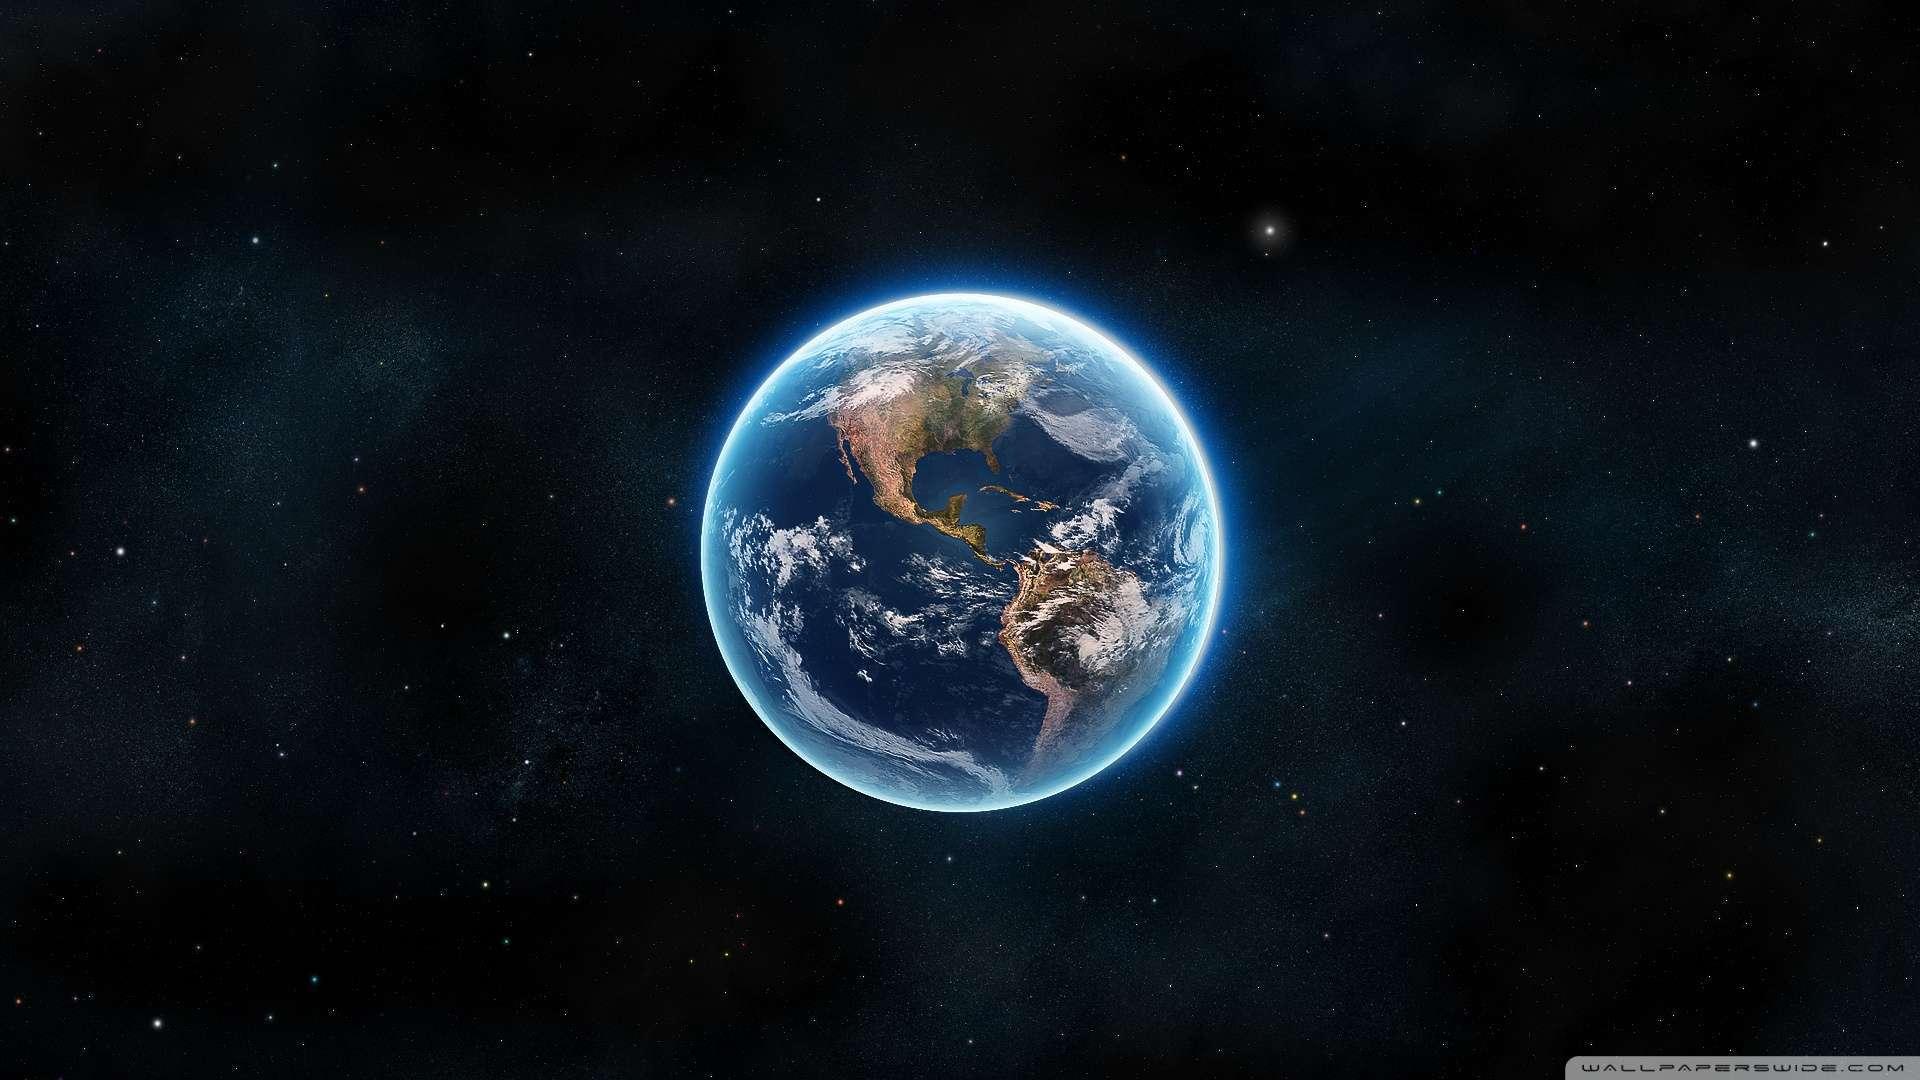 earth wallpaper hd 1080p - photo #5